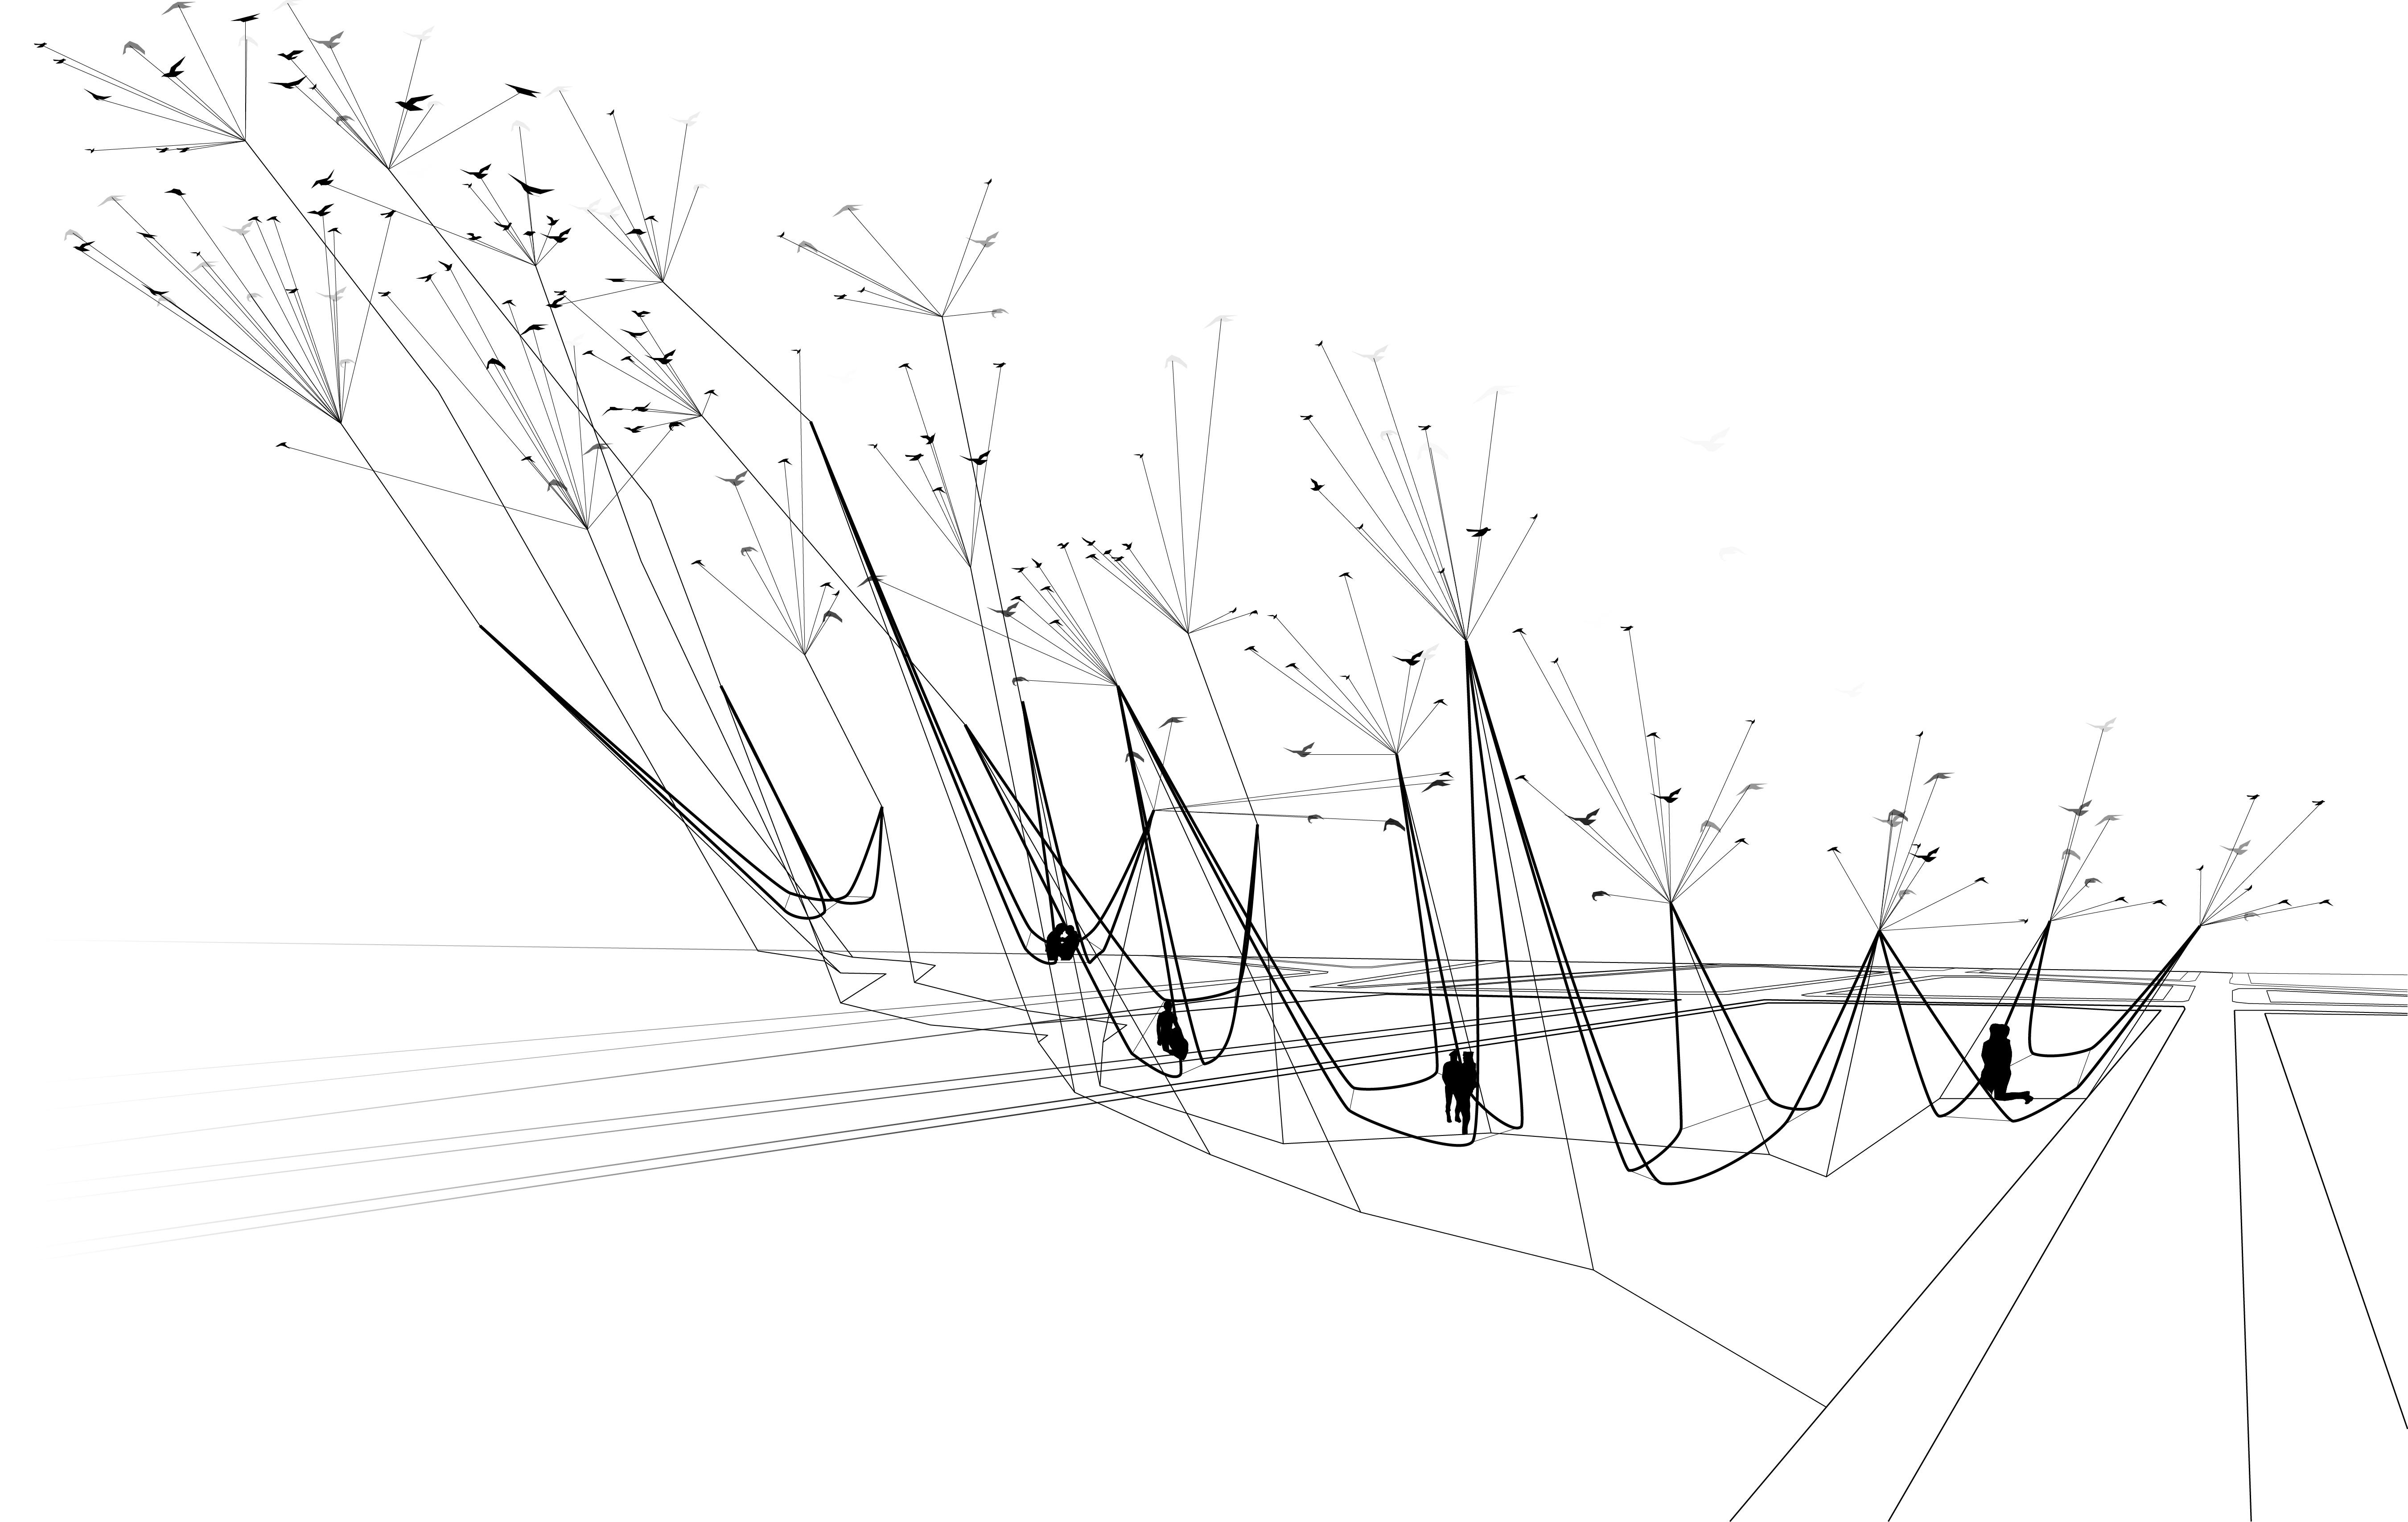 seth embry archinect A Profile for Resume urban exploratorium